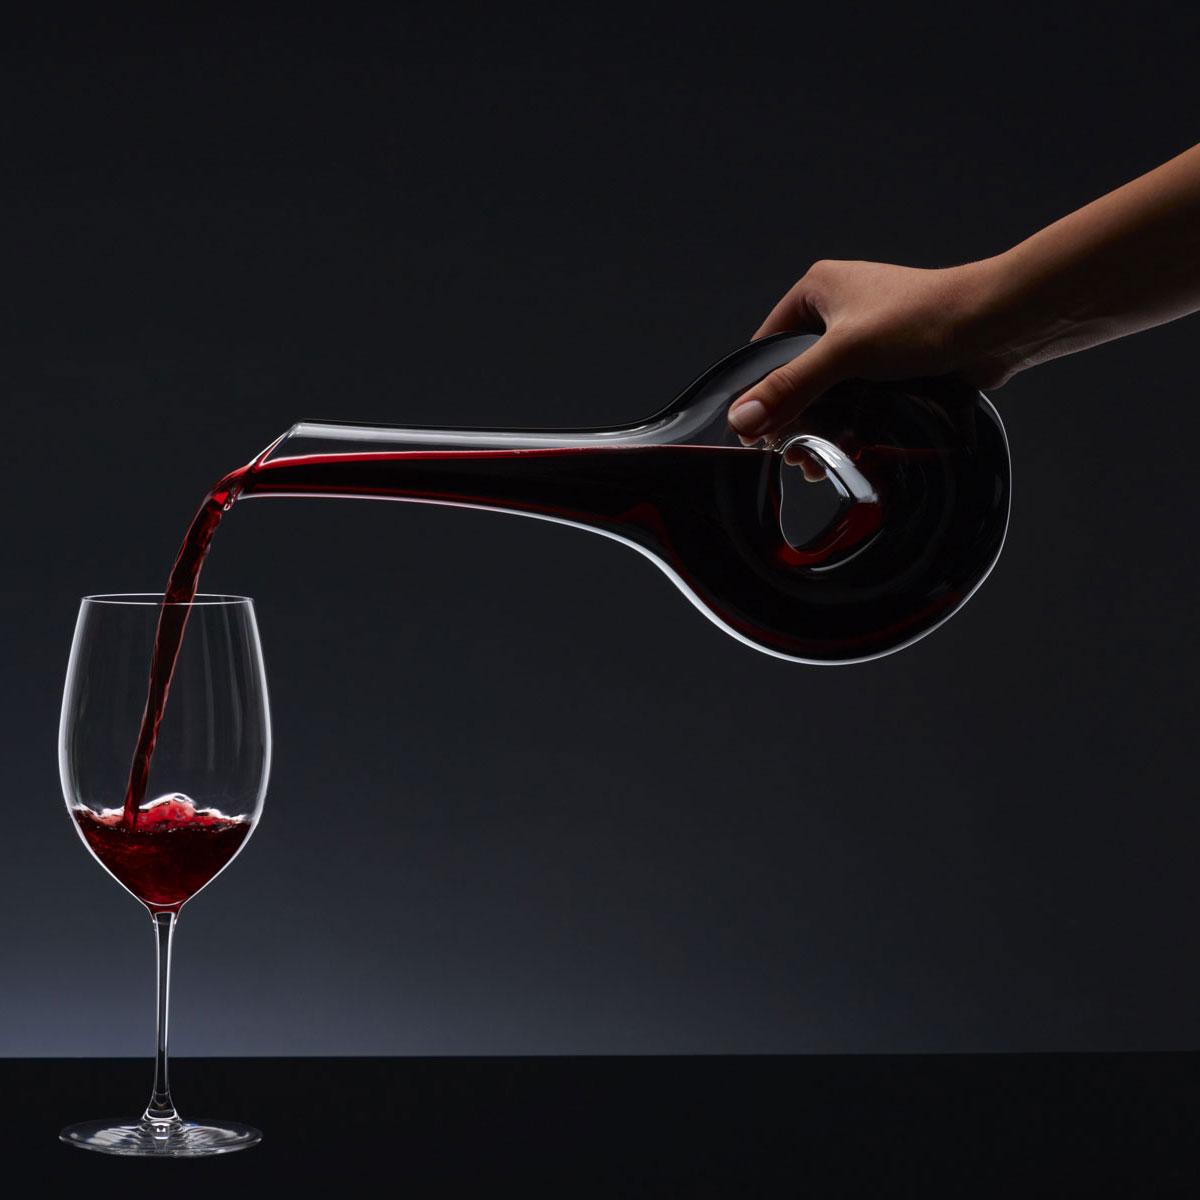 Riedel Sommeliers Black Tie Bliss Crystal Wine Decanter